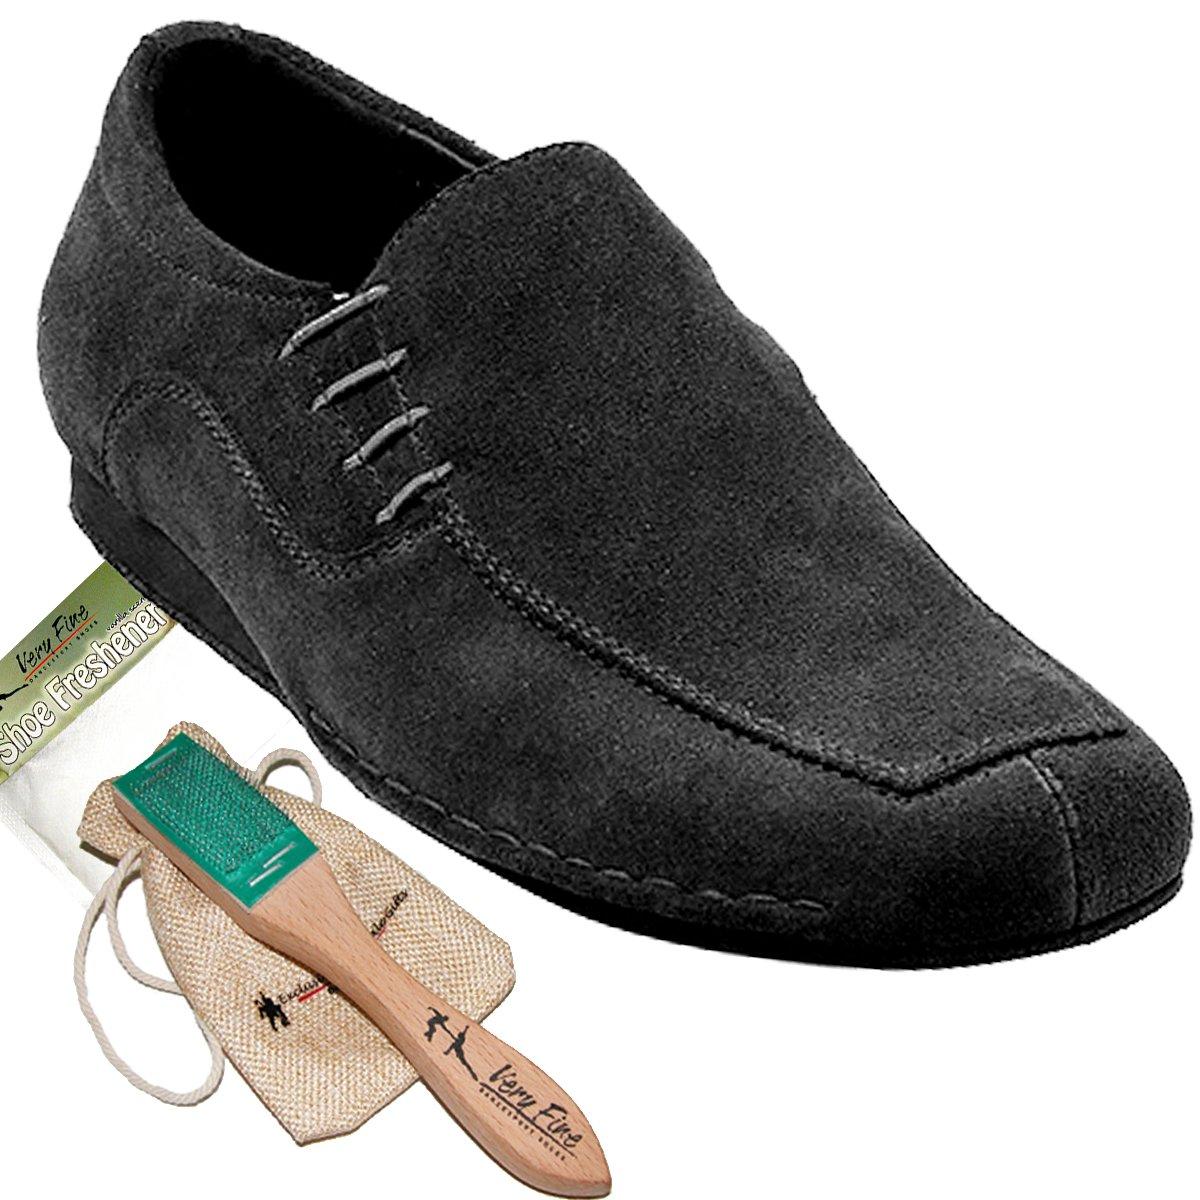 Men's Ballroom Latin Salsa Sneaker Dance Shoes Suede SERO102BBXEB Comfortable - Very Fine (Bundle Of 5) B078S3N2XM 10.5 D(M) US Black